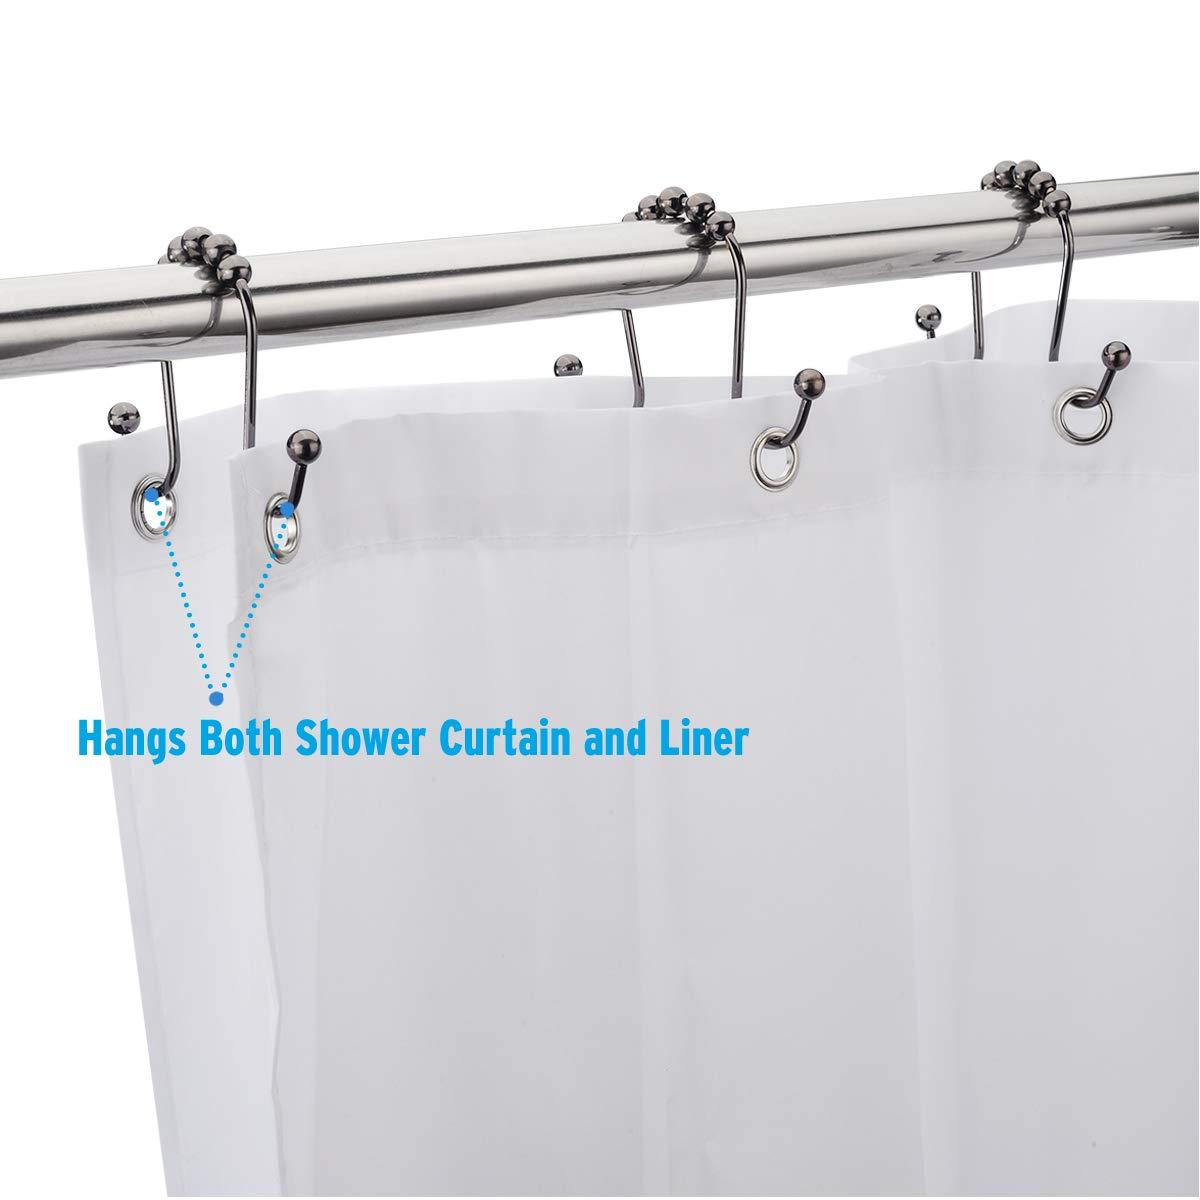 Amazer Shower Curtain Hooks Rust-Resistant Stainless Steel Double Glide Shower Hook Rings for Bathroom Shower Rod Curtains Gunmetal Color Bronze Set of 12 Hooks